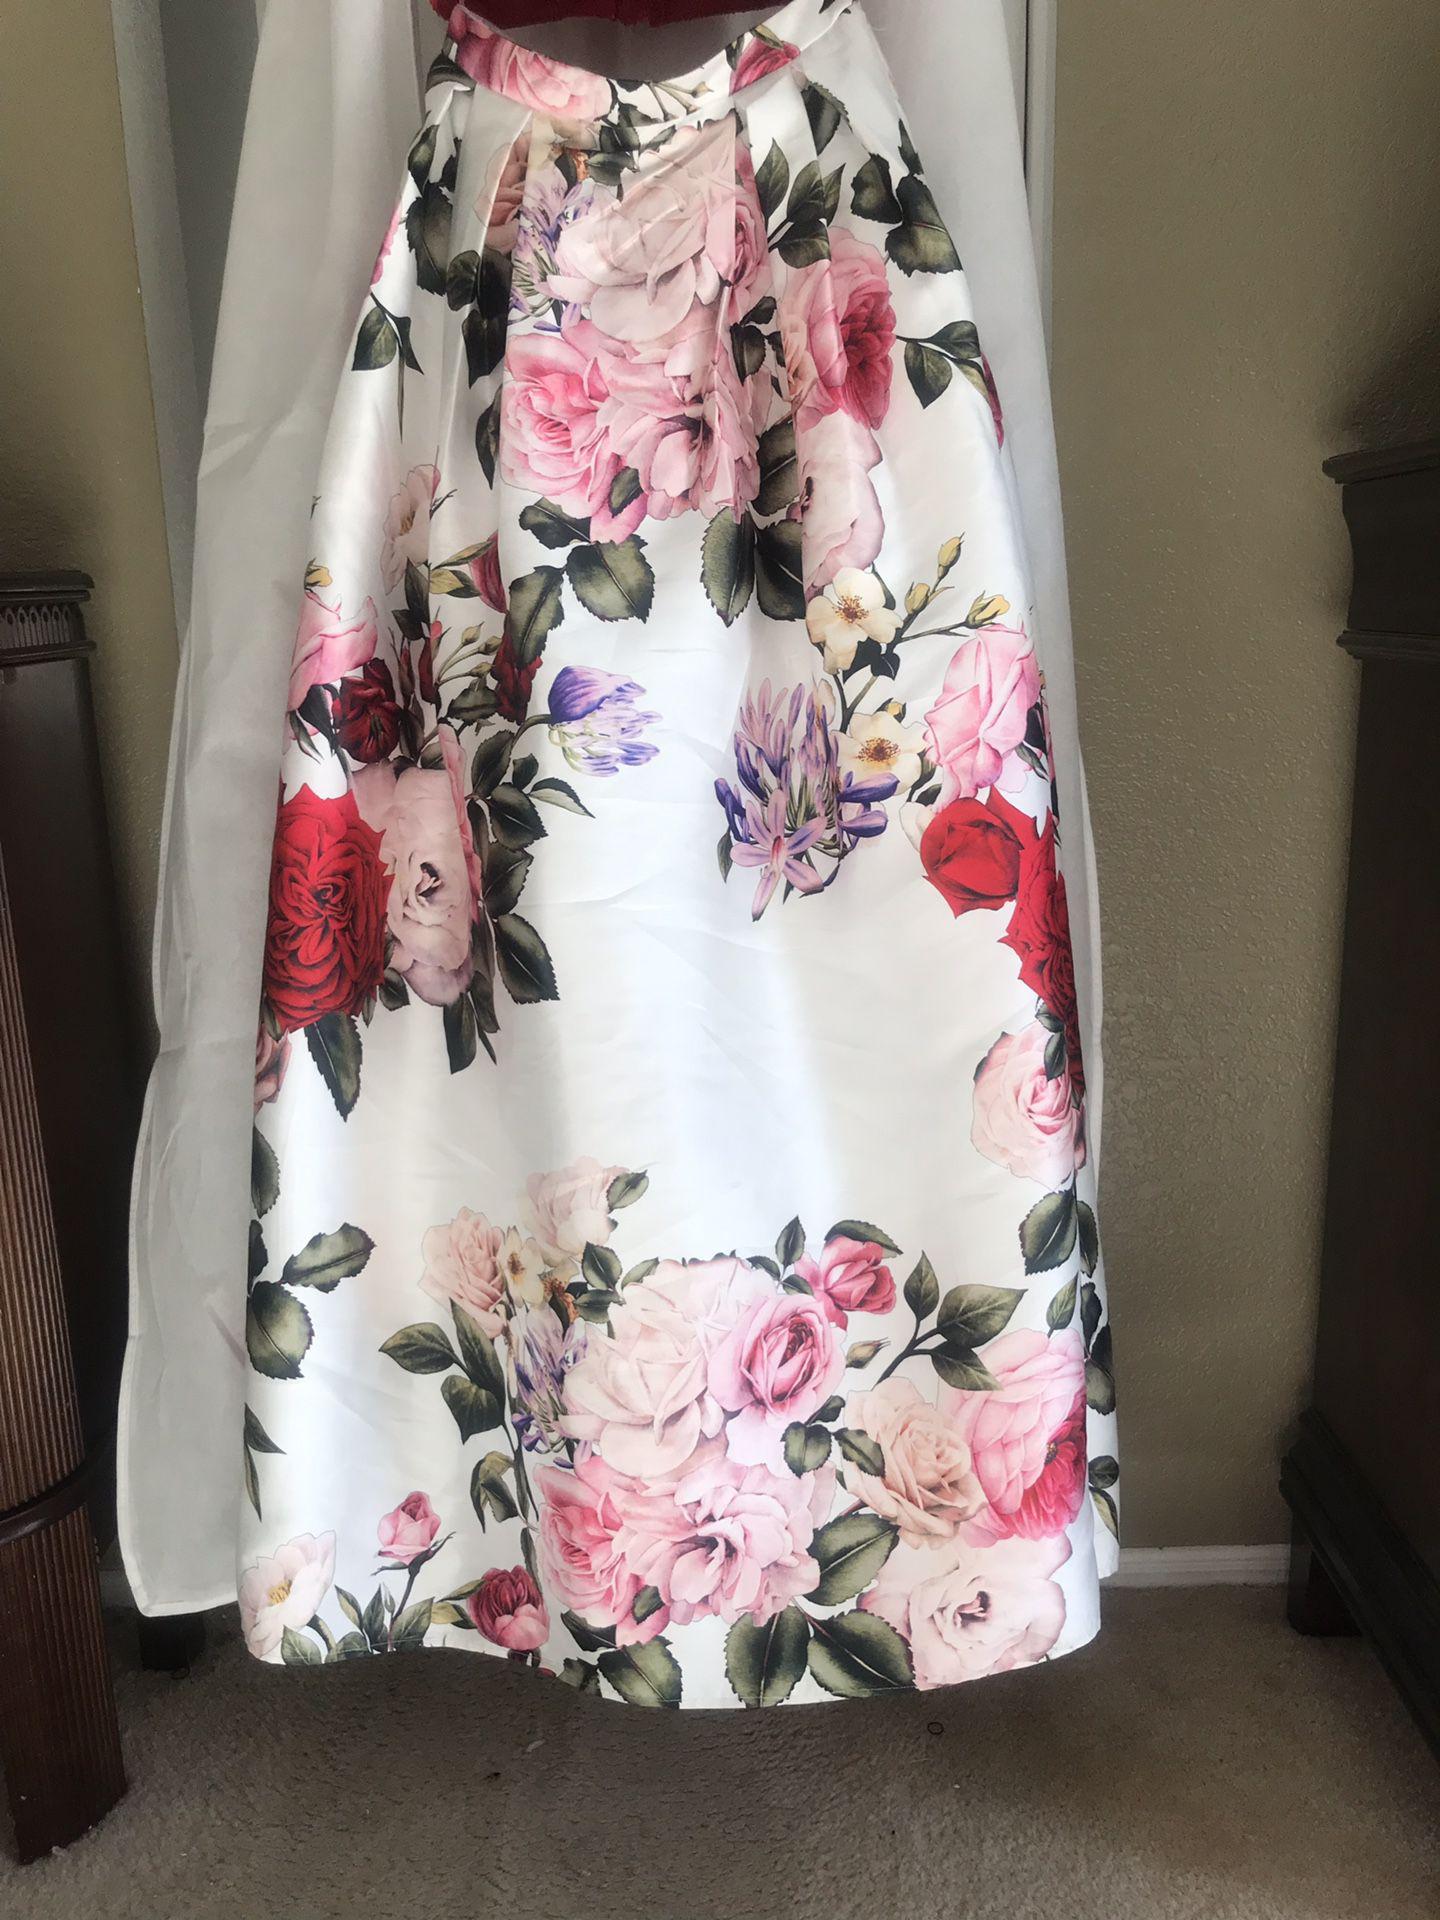 2 Piece/ Long/ Off the Shoulders/ Formal Dress